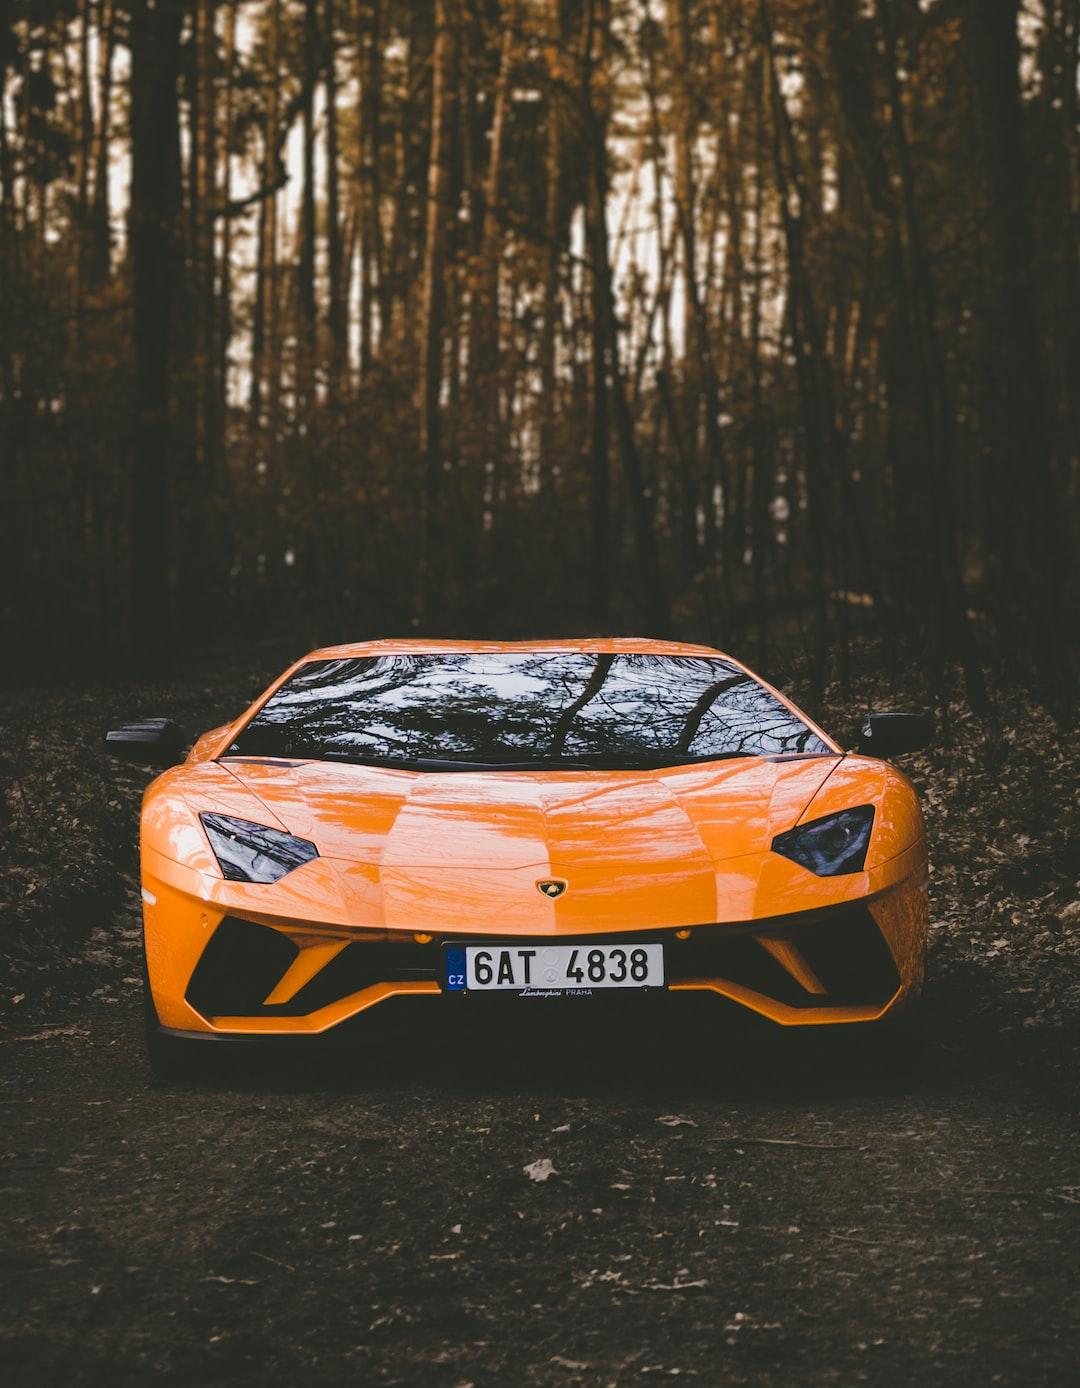 BMW Orange Park >> Lamborghini Wallpapers: Free HD Download [500+ HQ]   Unsplash